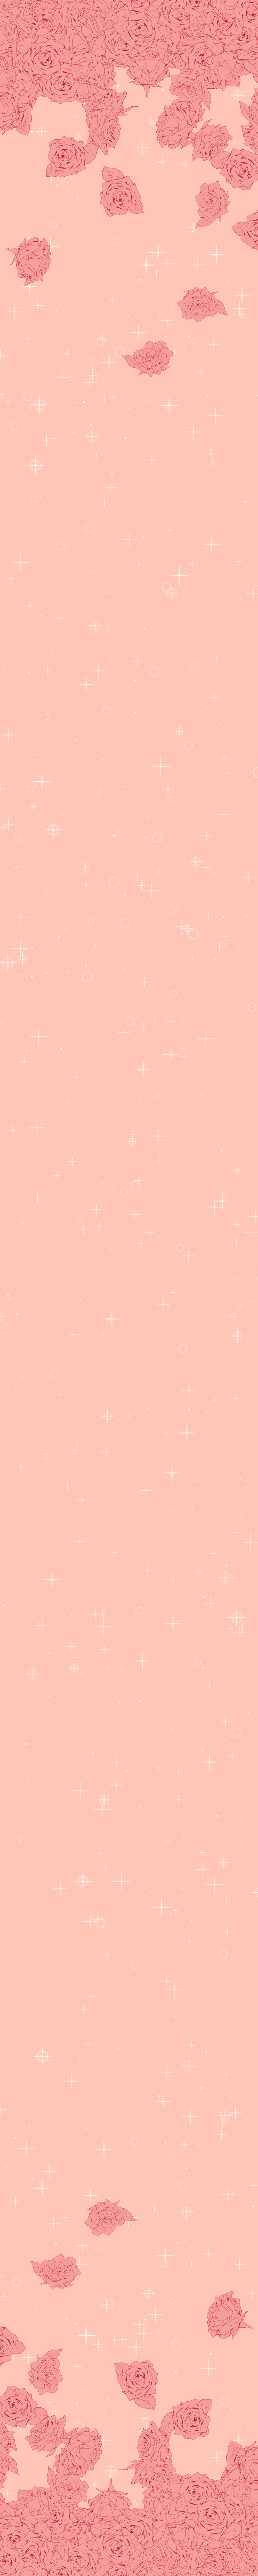 Glitter Rose - Custom Box Background by RorrieGoesRawr